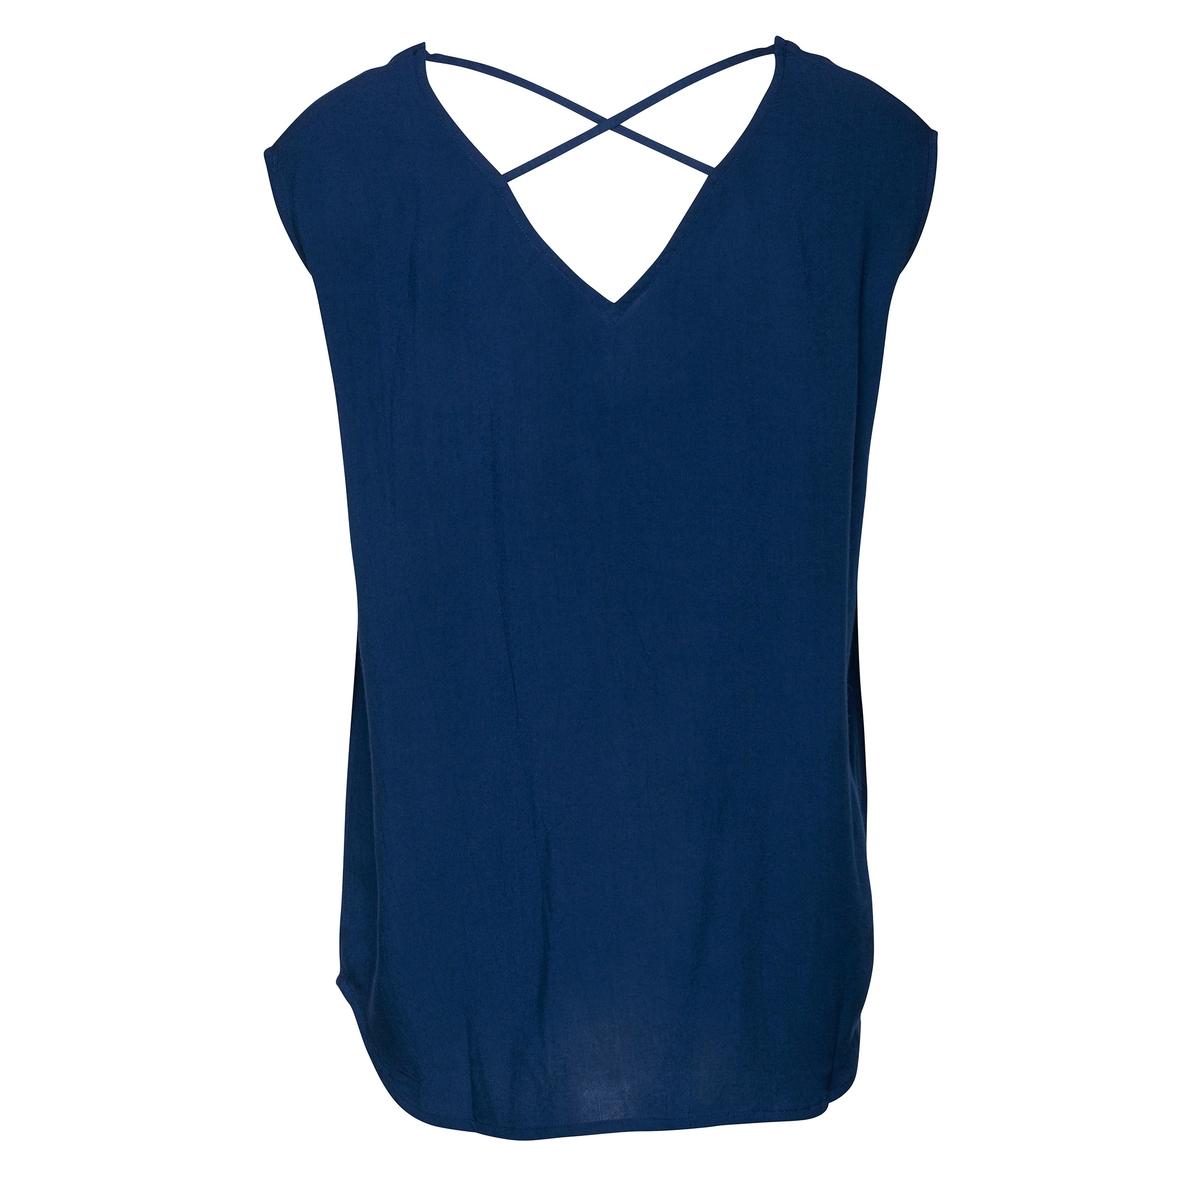 Блузка с рисунком, короткие рукава, вырез сзади